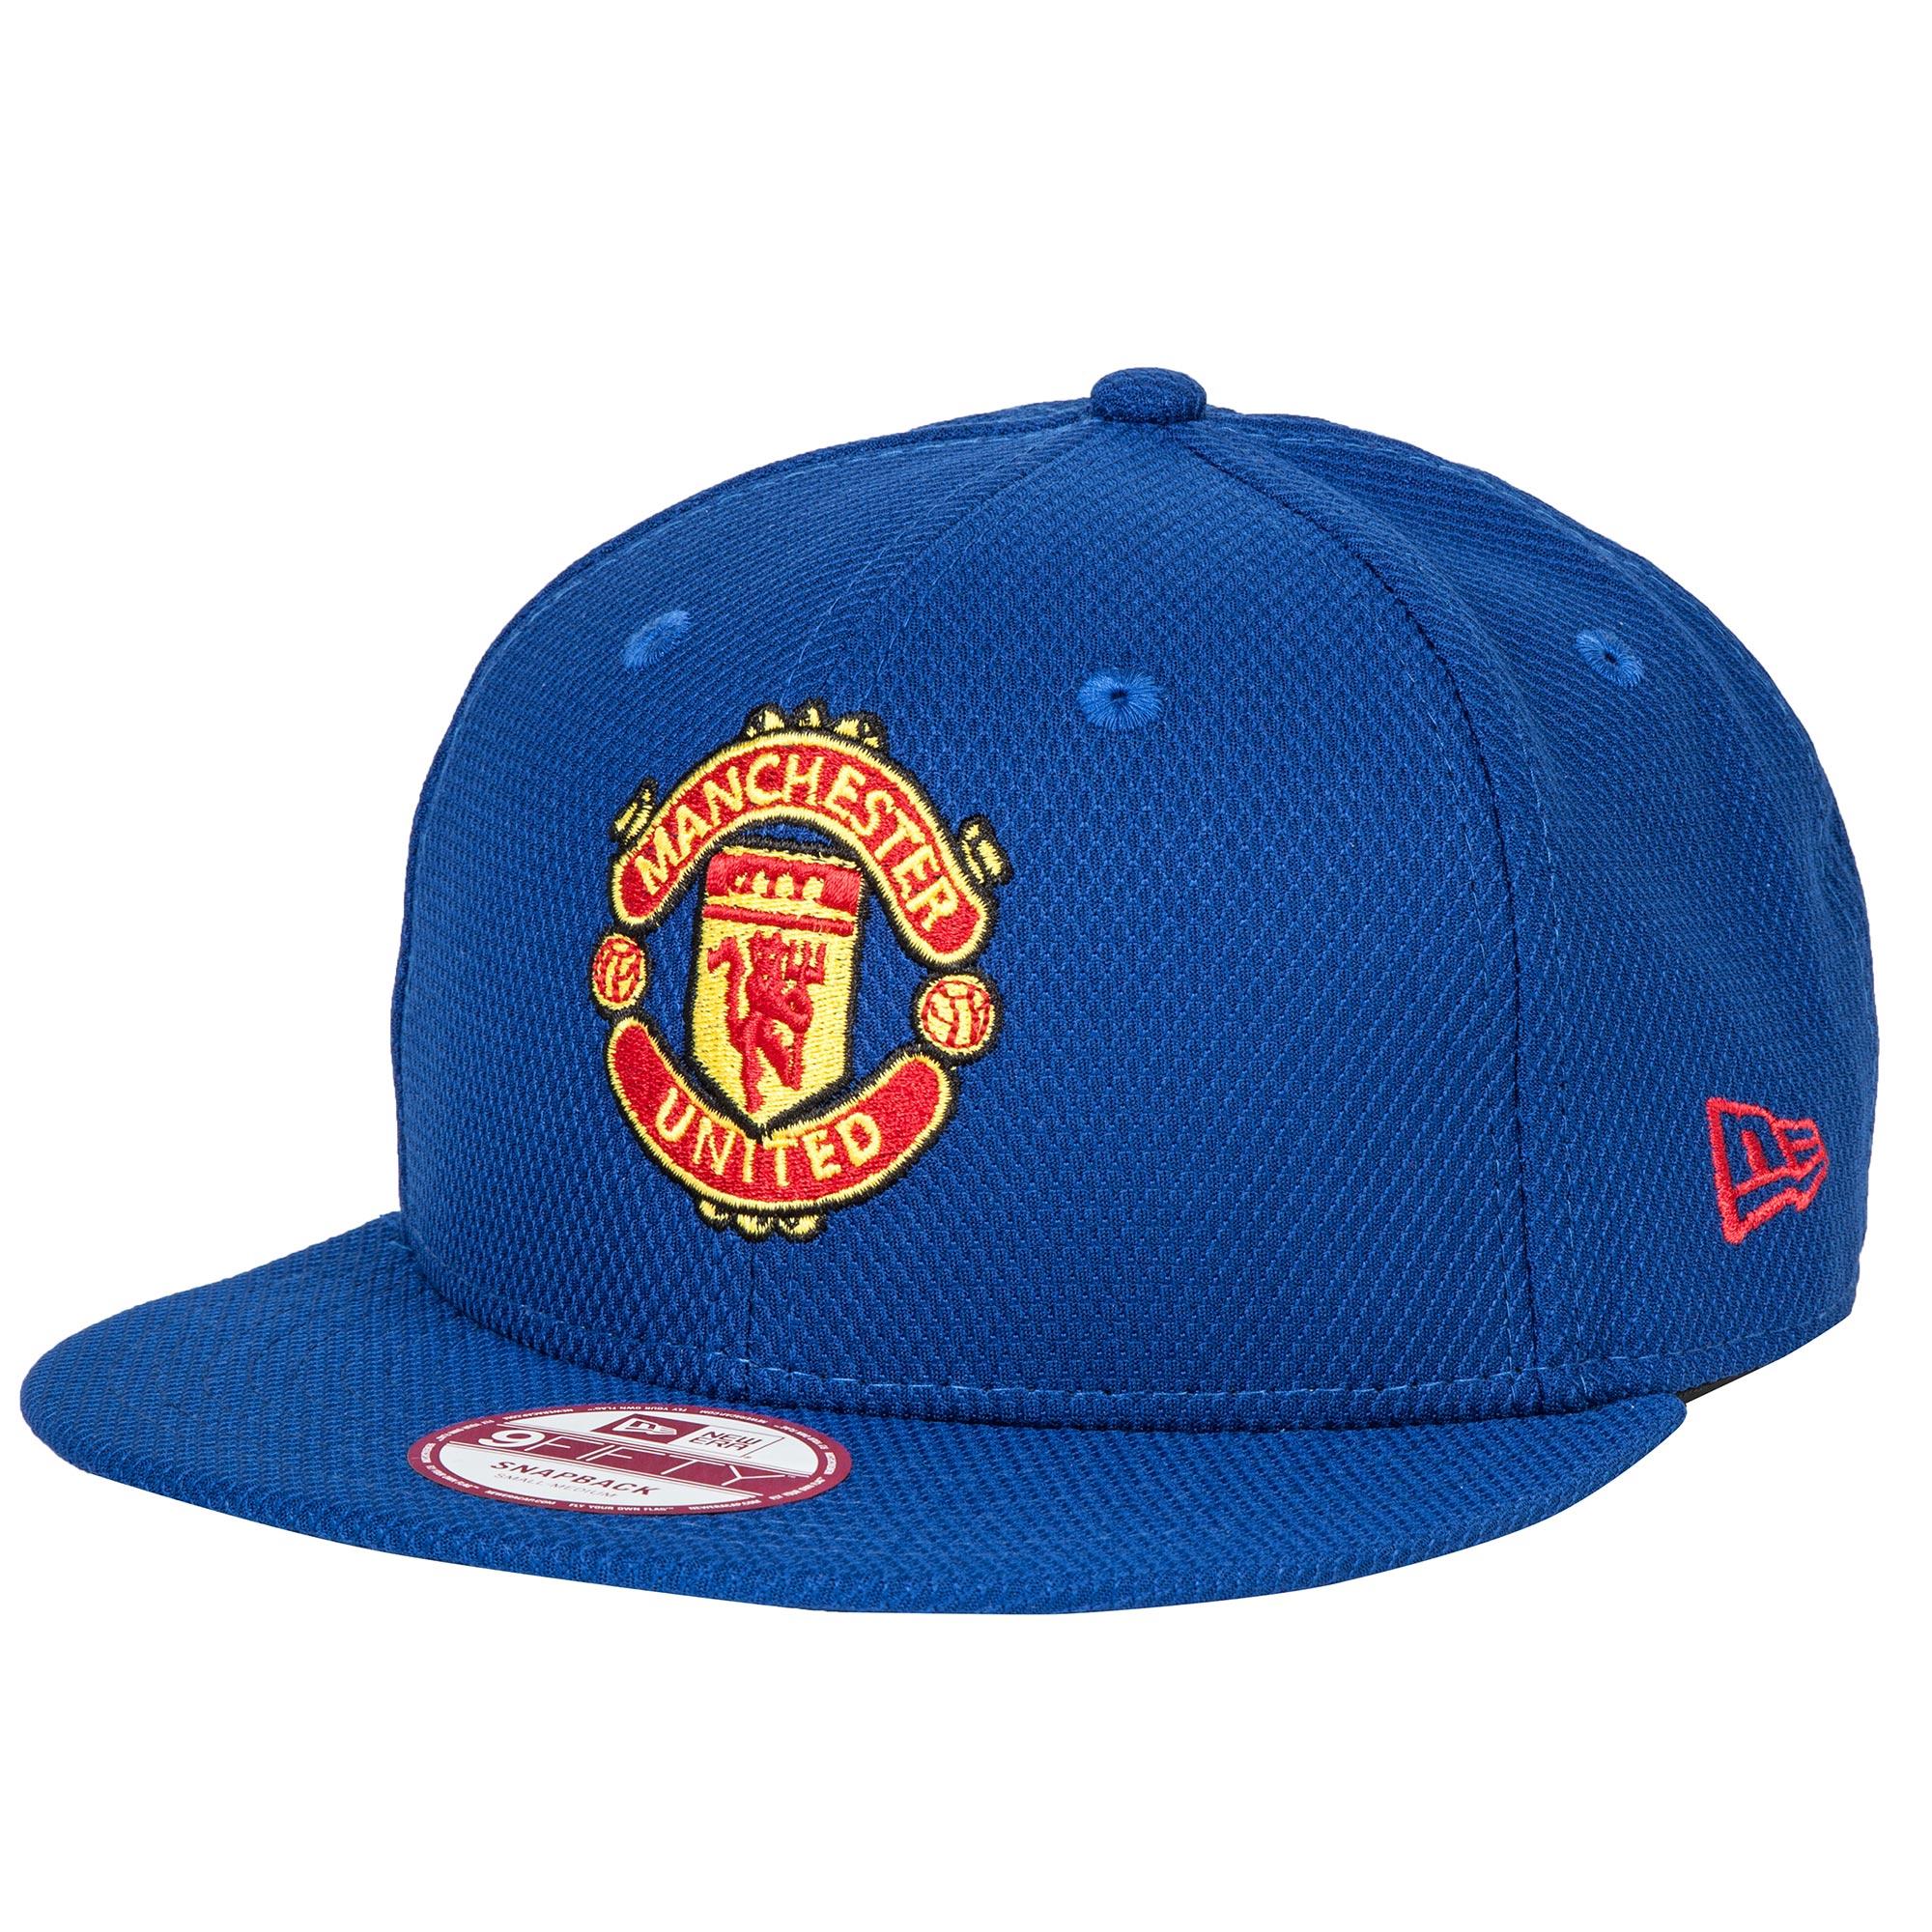 Manchester United New Era 9FIFTY Diamond Era Snapback Cap - Royal - Ad